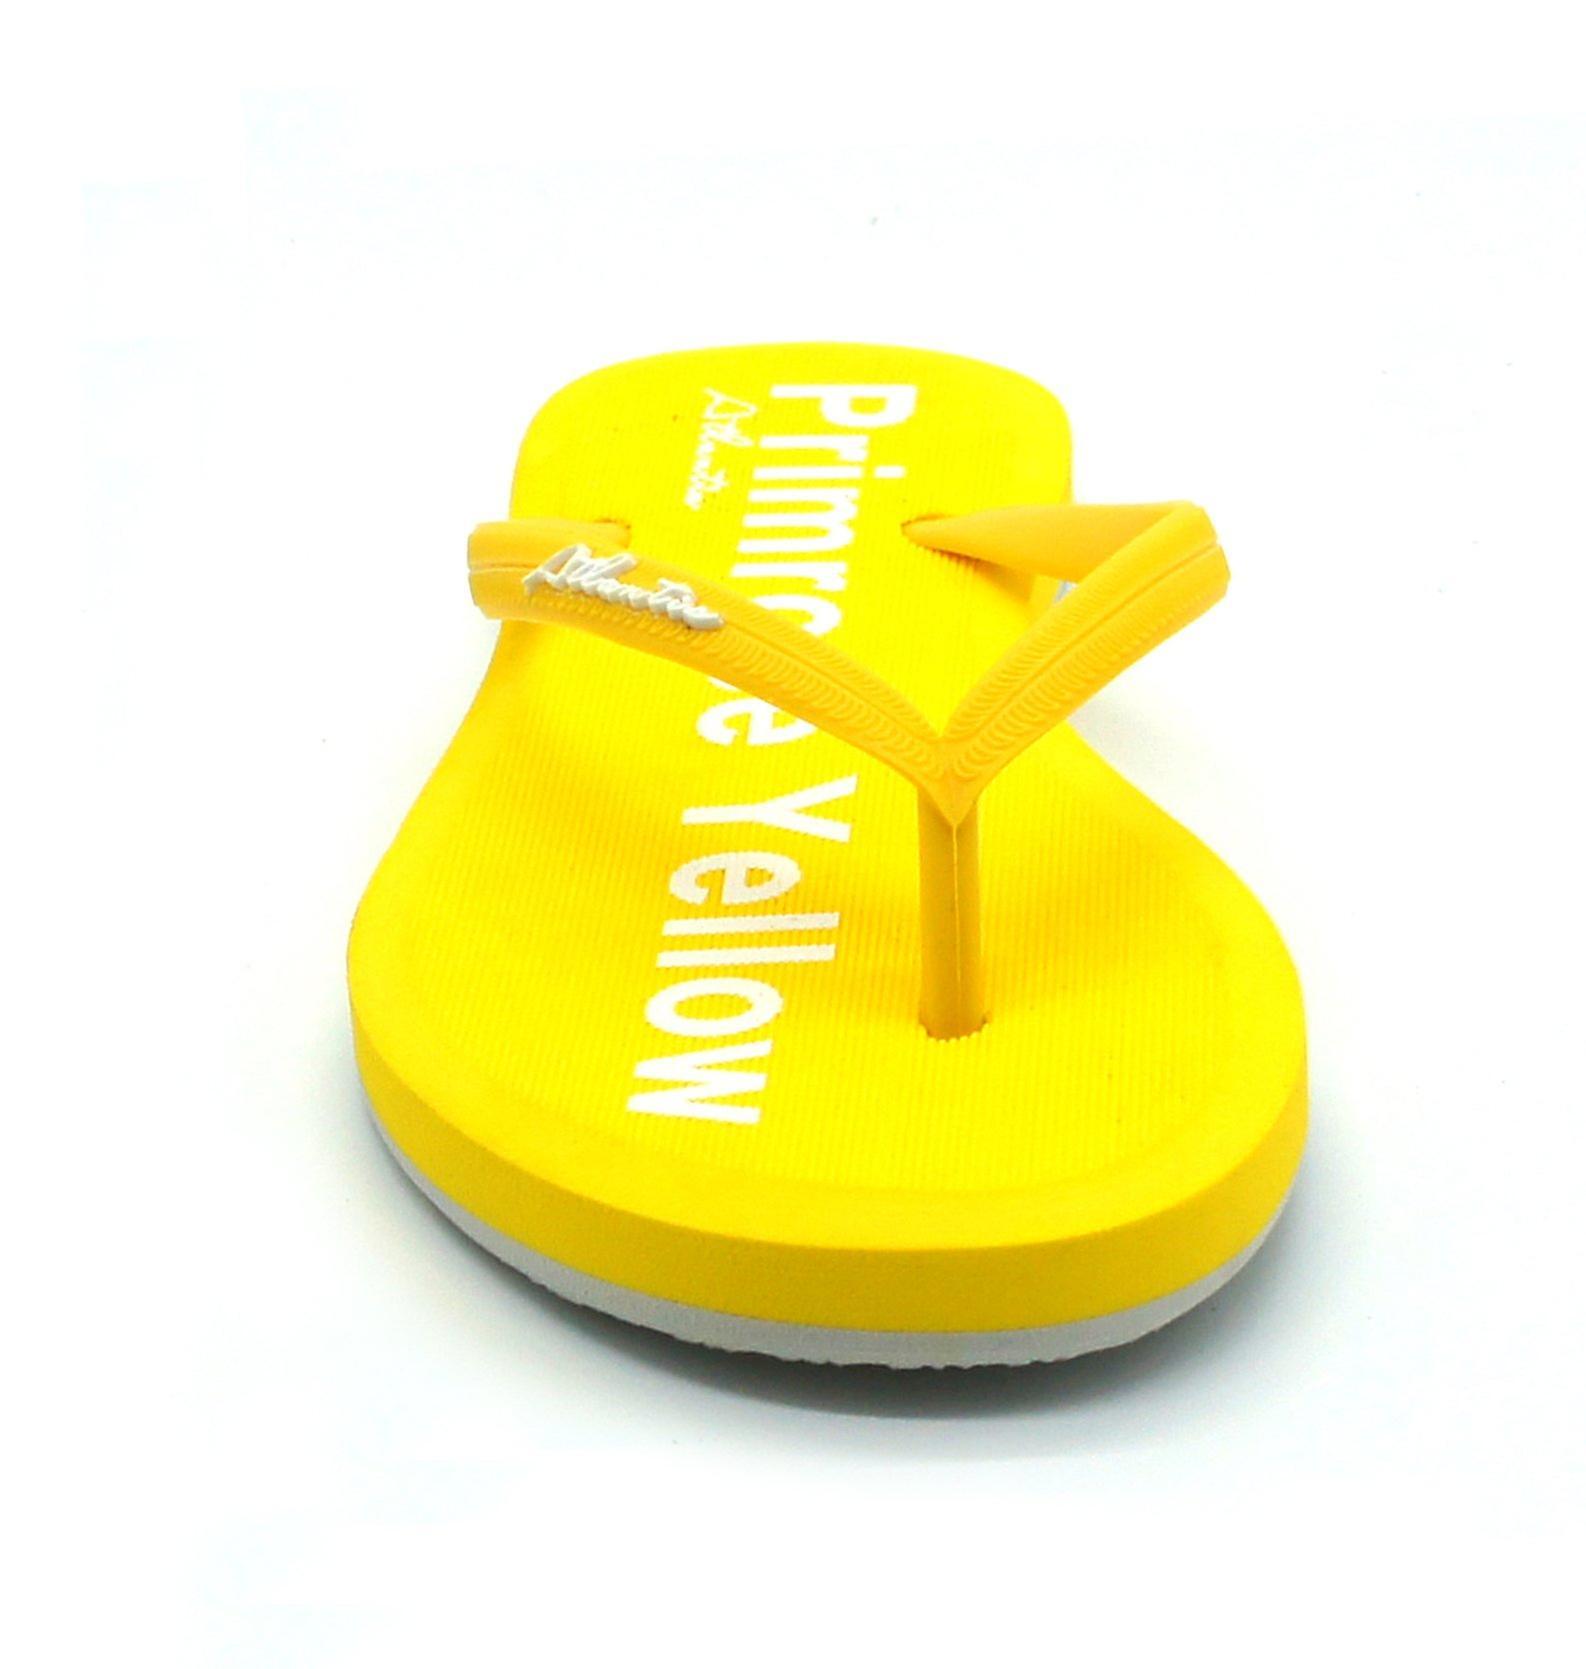 Simply colorful primrose yellow flip flops